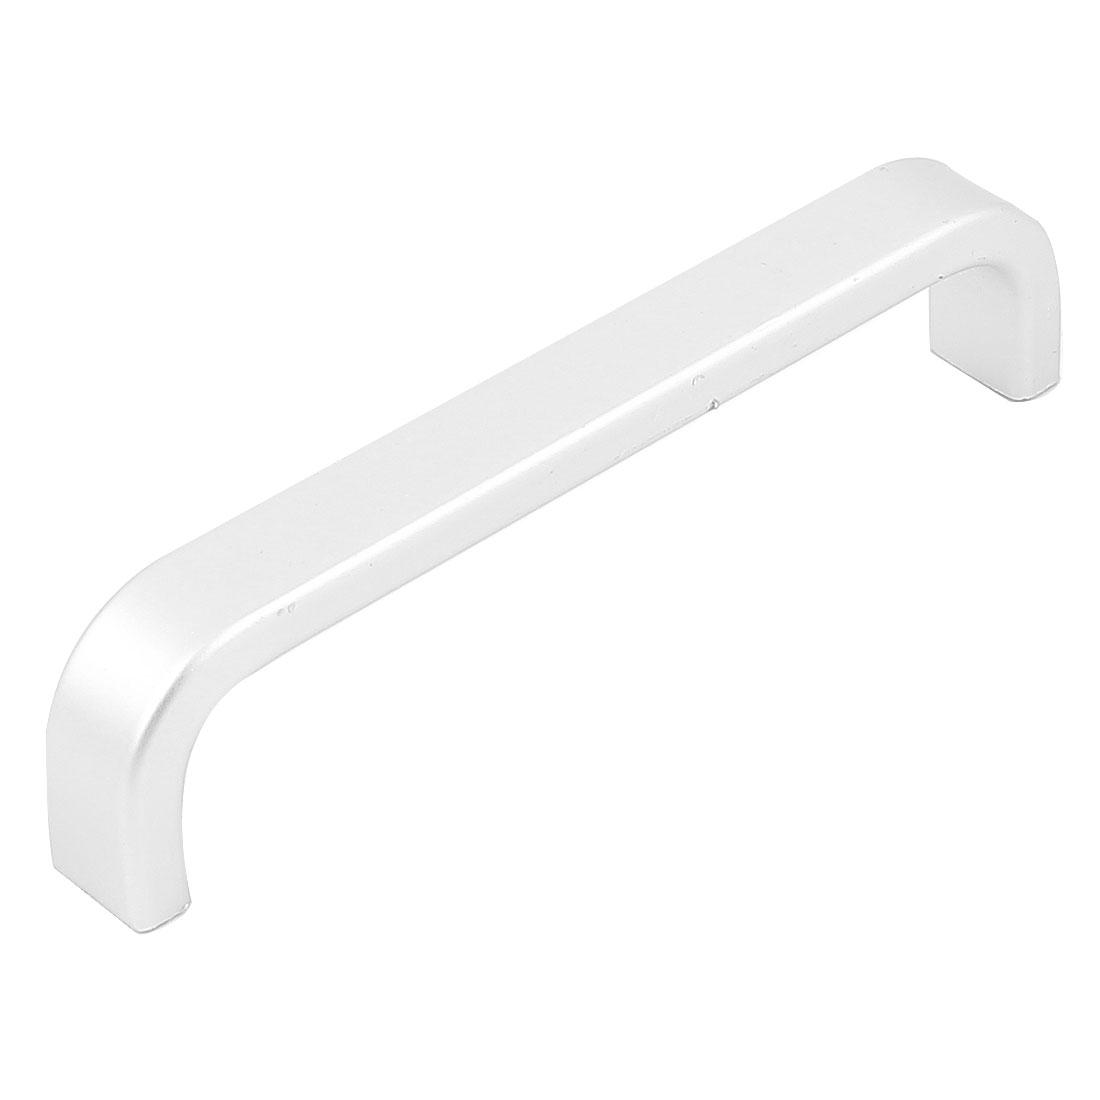 102mm Long Dresser Cabinet Drawer Door Aluminium Alloy Pull Handle